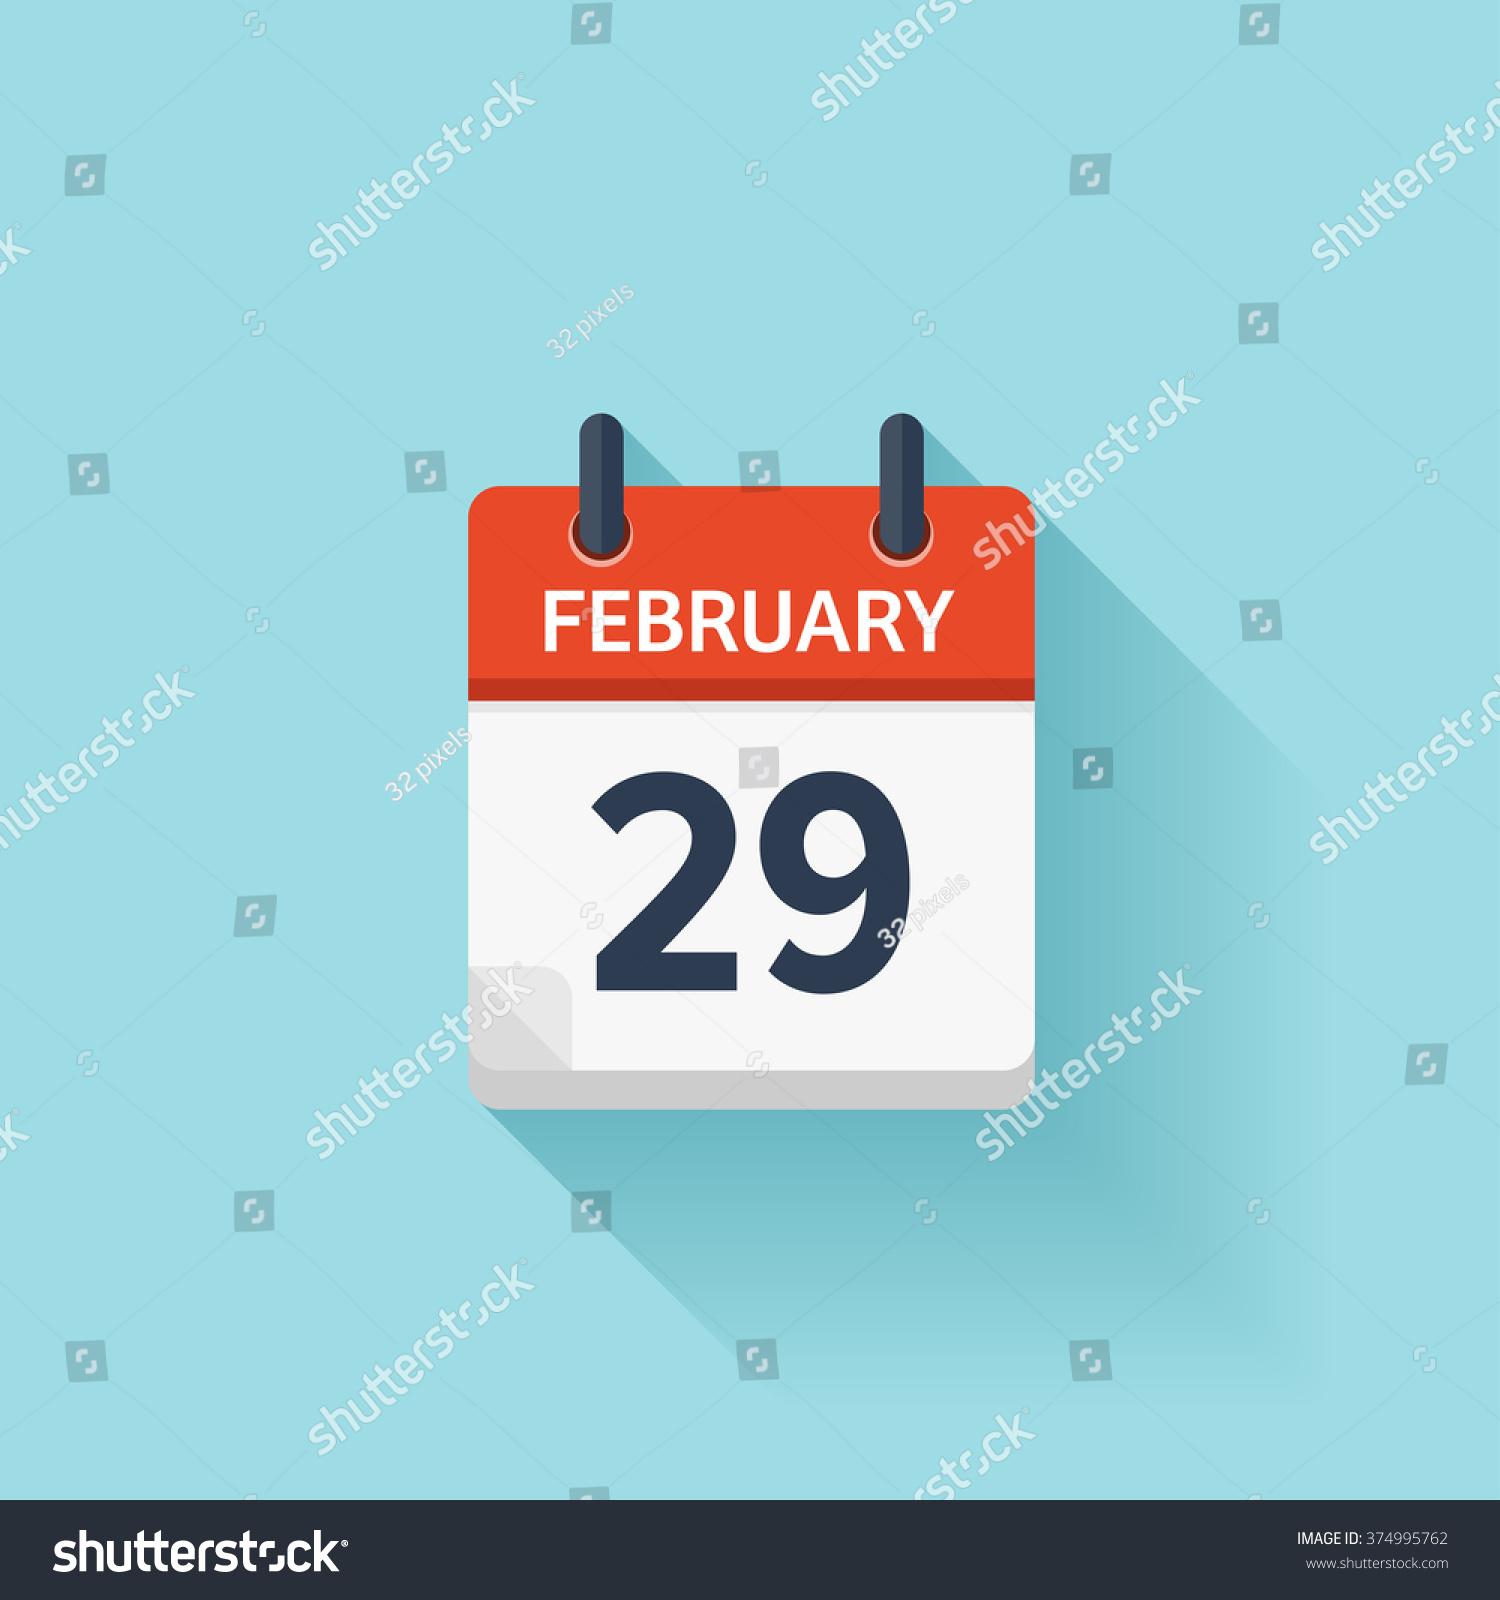 February Calendar Illustration : February calendar iconvector illustrationflat